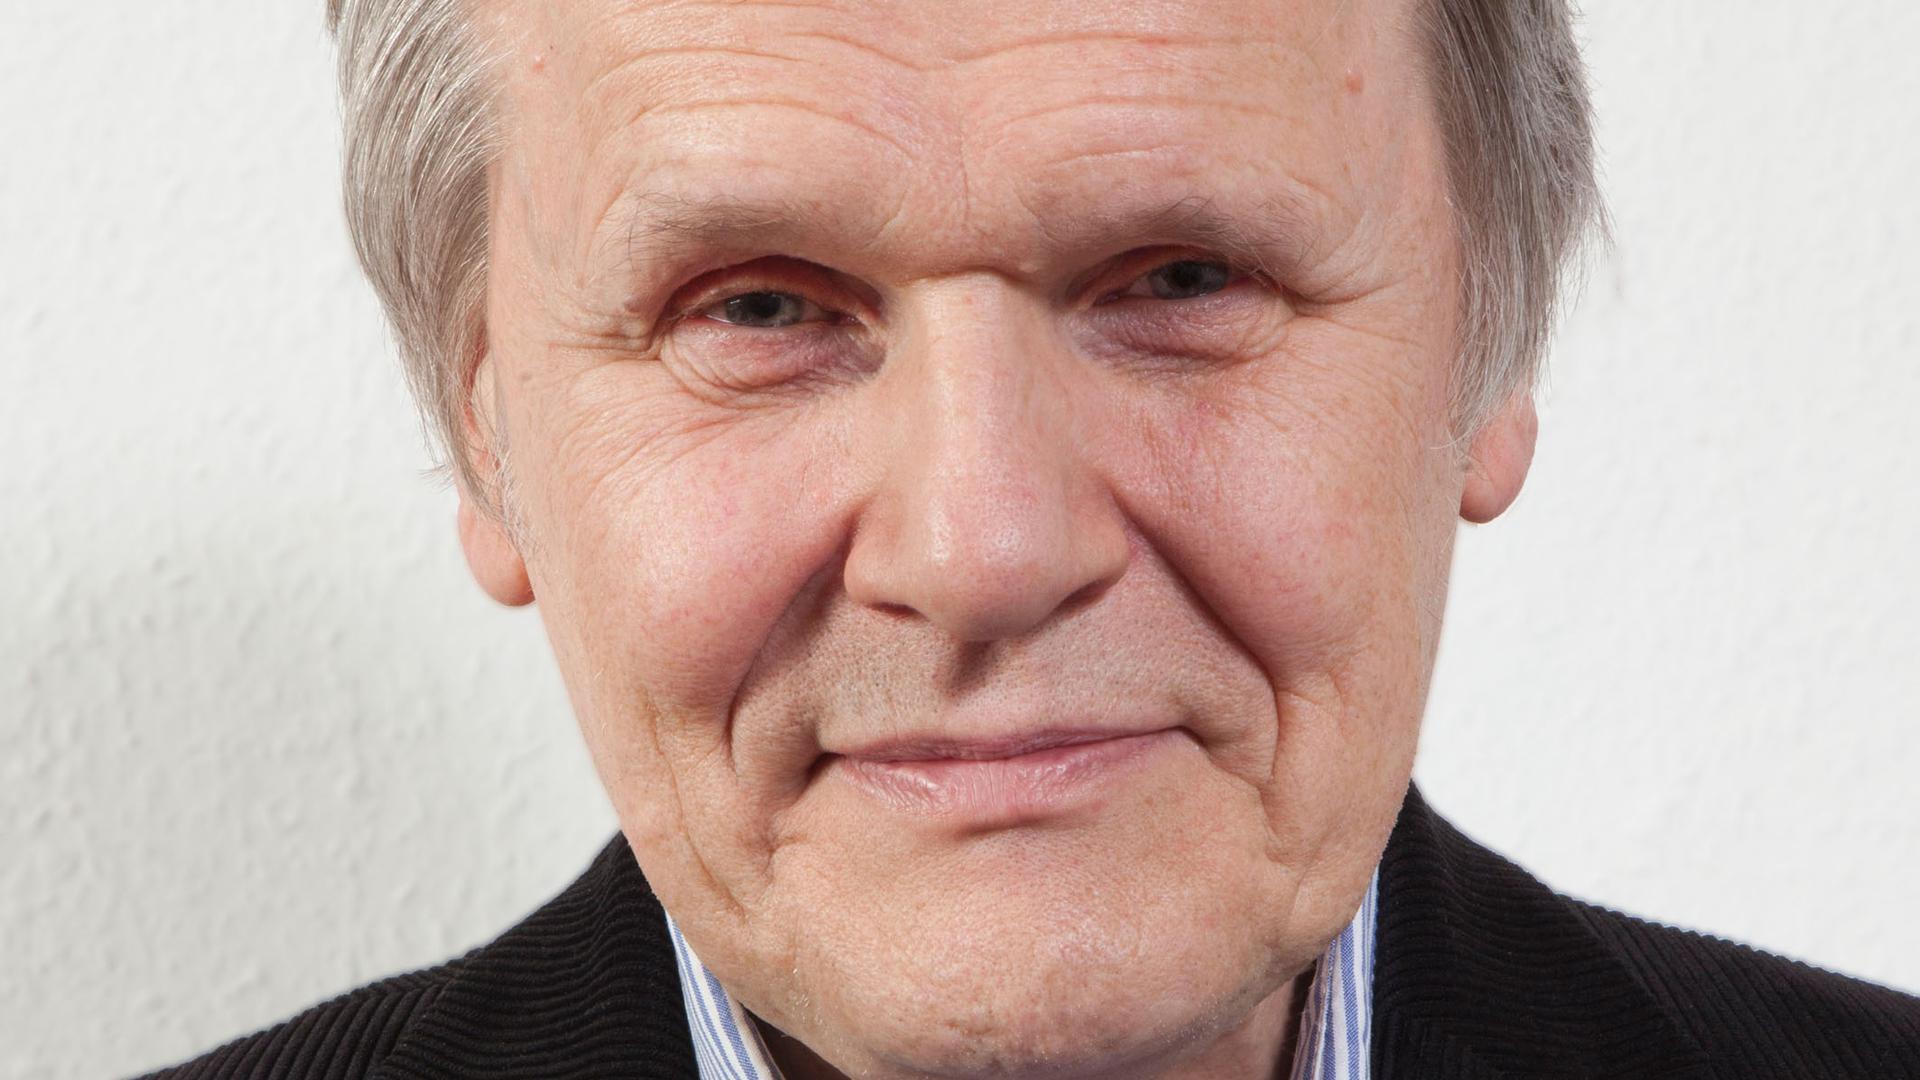 Der Berliner Psychologe Dr. Wolfgang Krüger befasst sich mit Formen der Freundschaft.